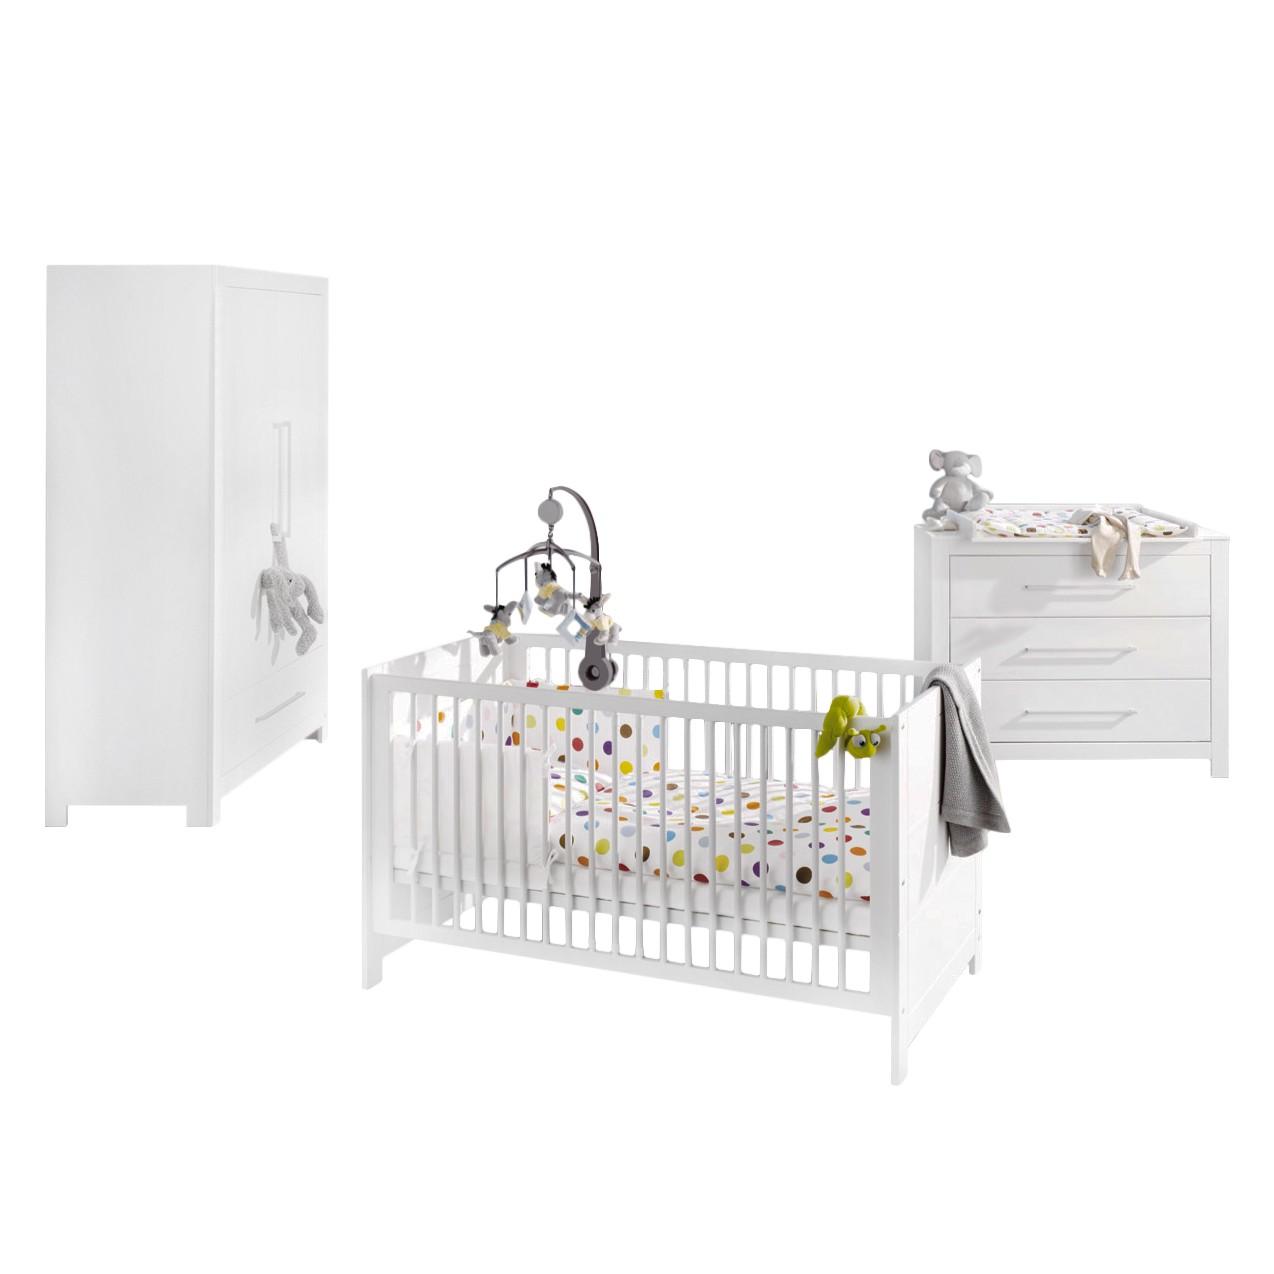 Chambre de bébé Puro (3 éléments) - Sapin - Blanc, Pinolino